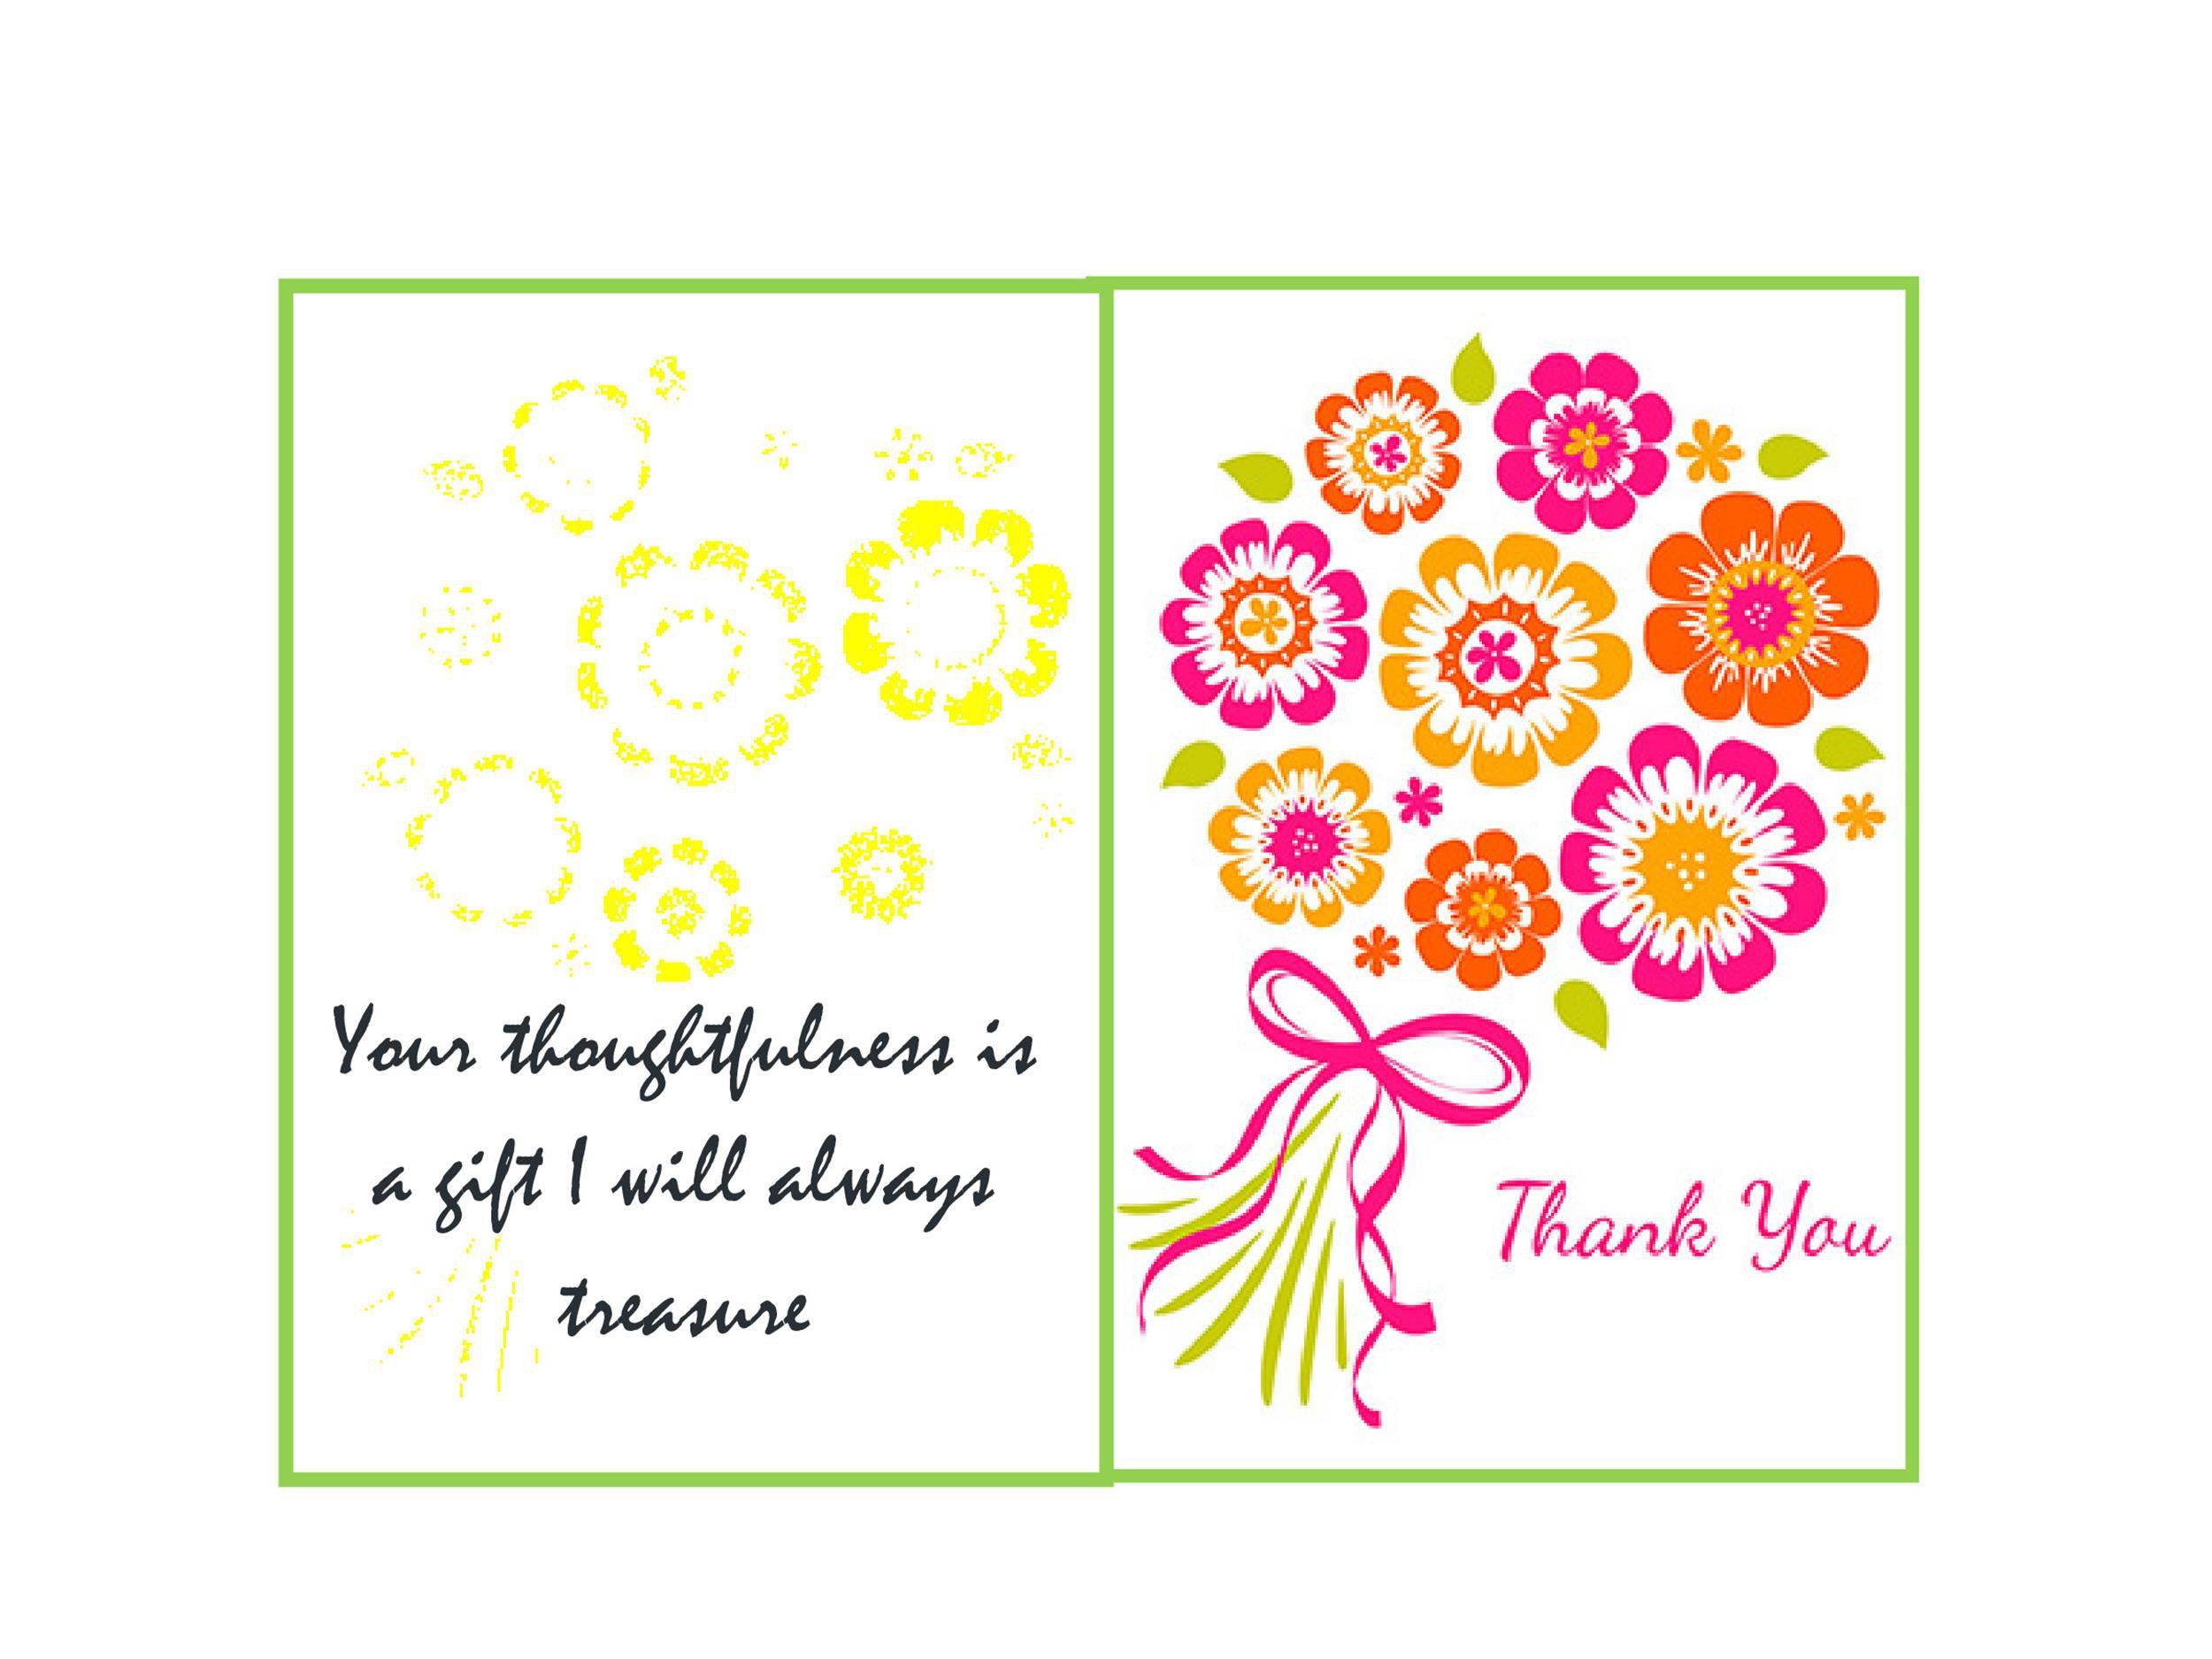 011 Striking Free Printable Photo Card Template Inspiration  Templates Birthday Thank YouFull